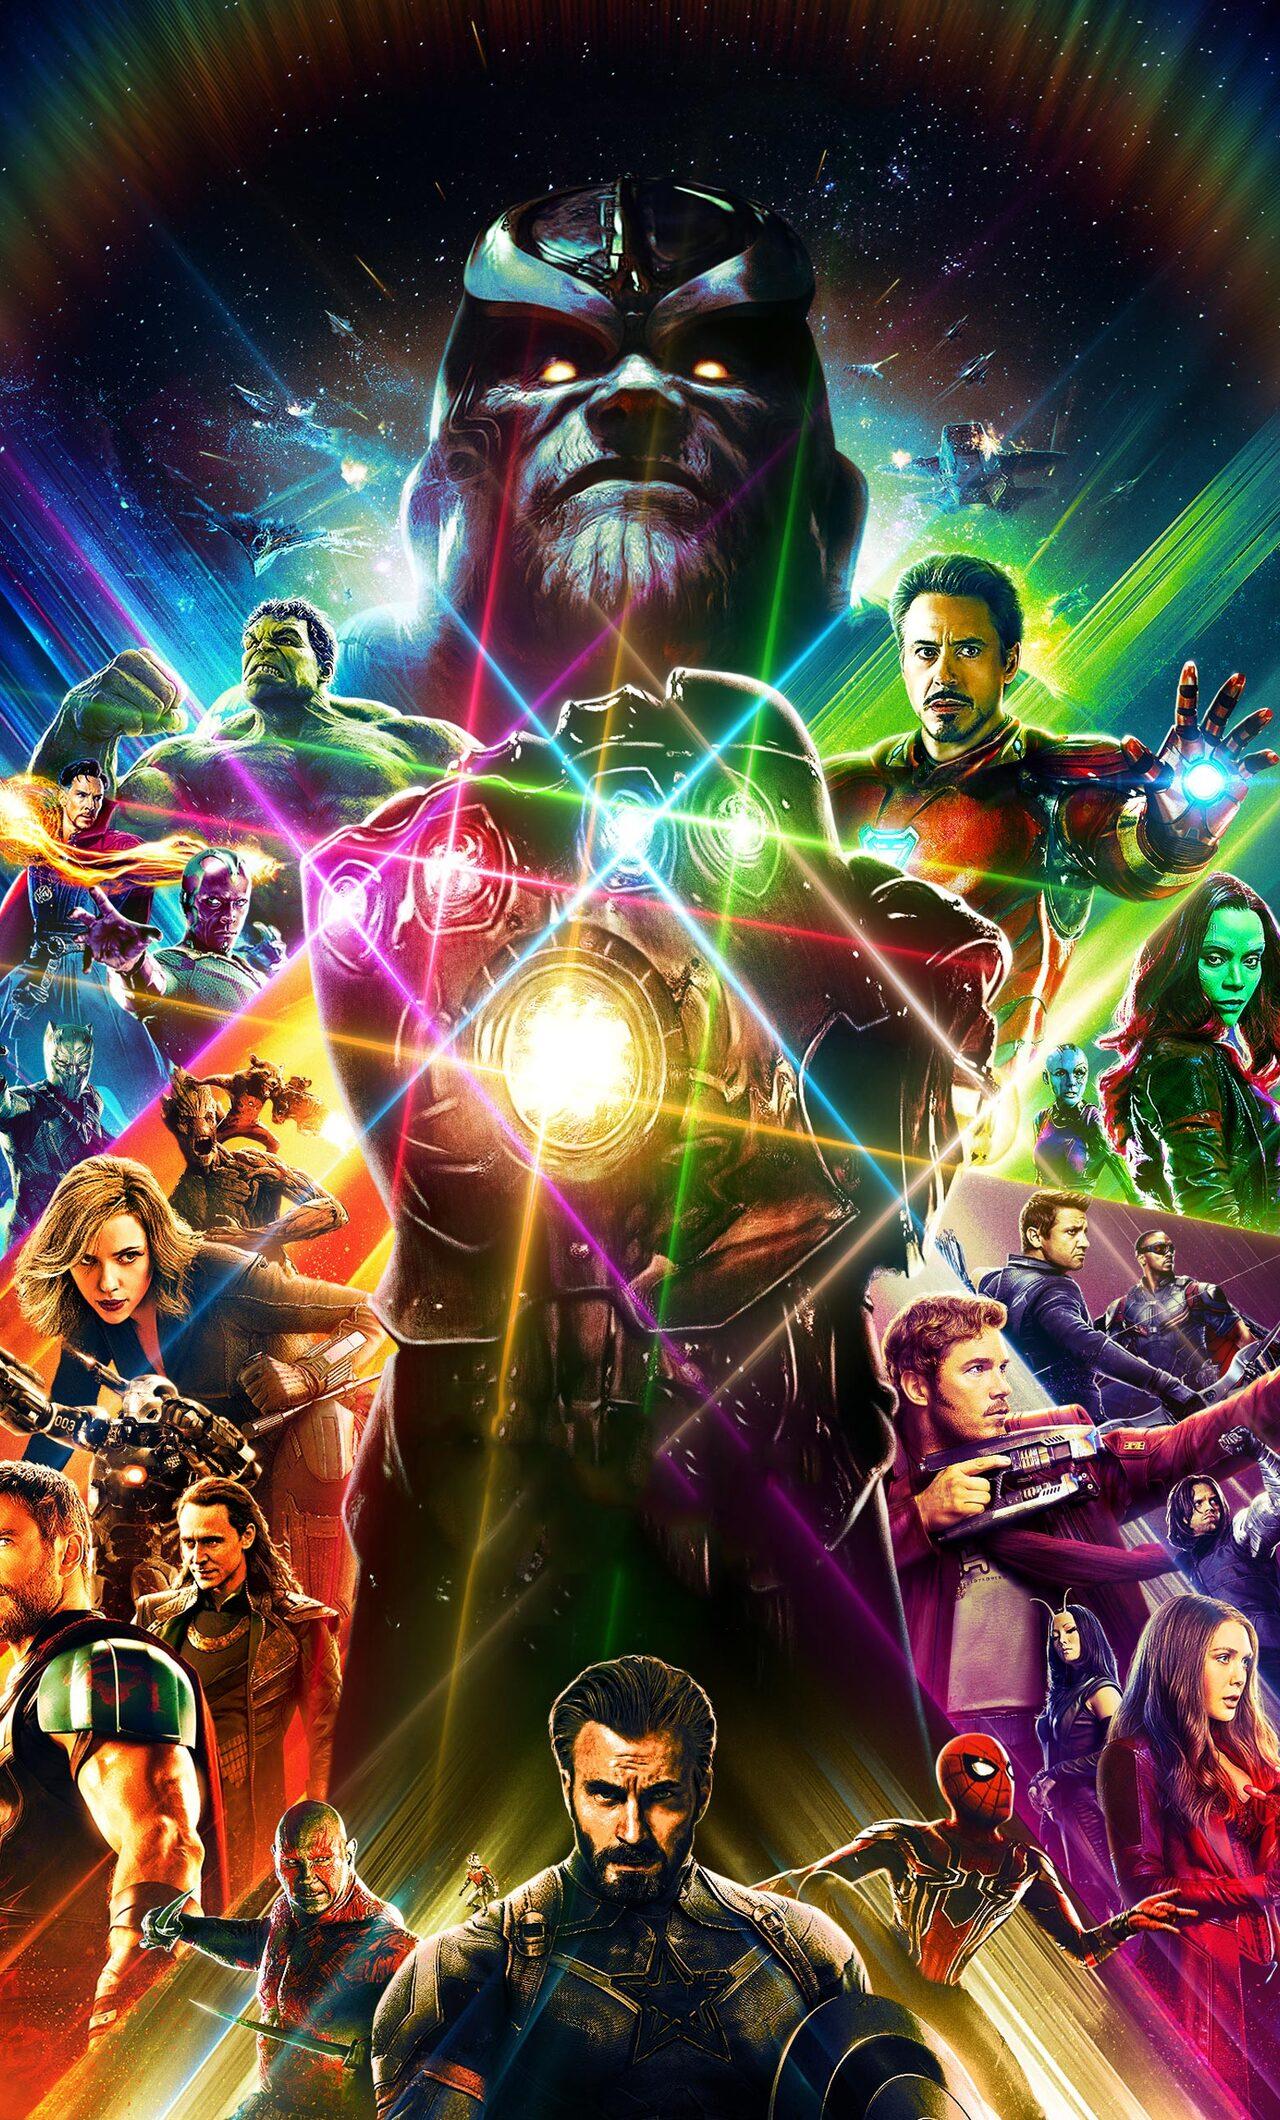 Lego Star Wars Iphone Wallpaper 1280x2120 Avengers Infinity War Artwork 2018 Iphone 6 Hd